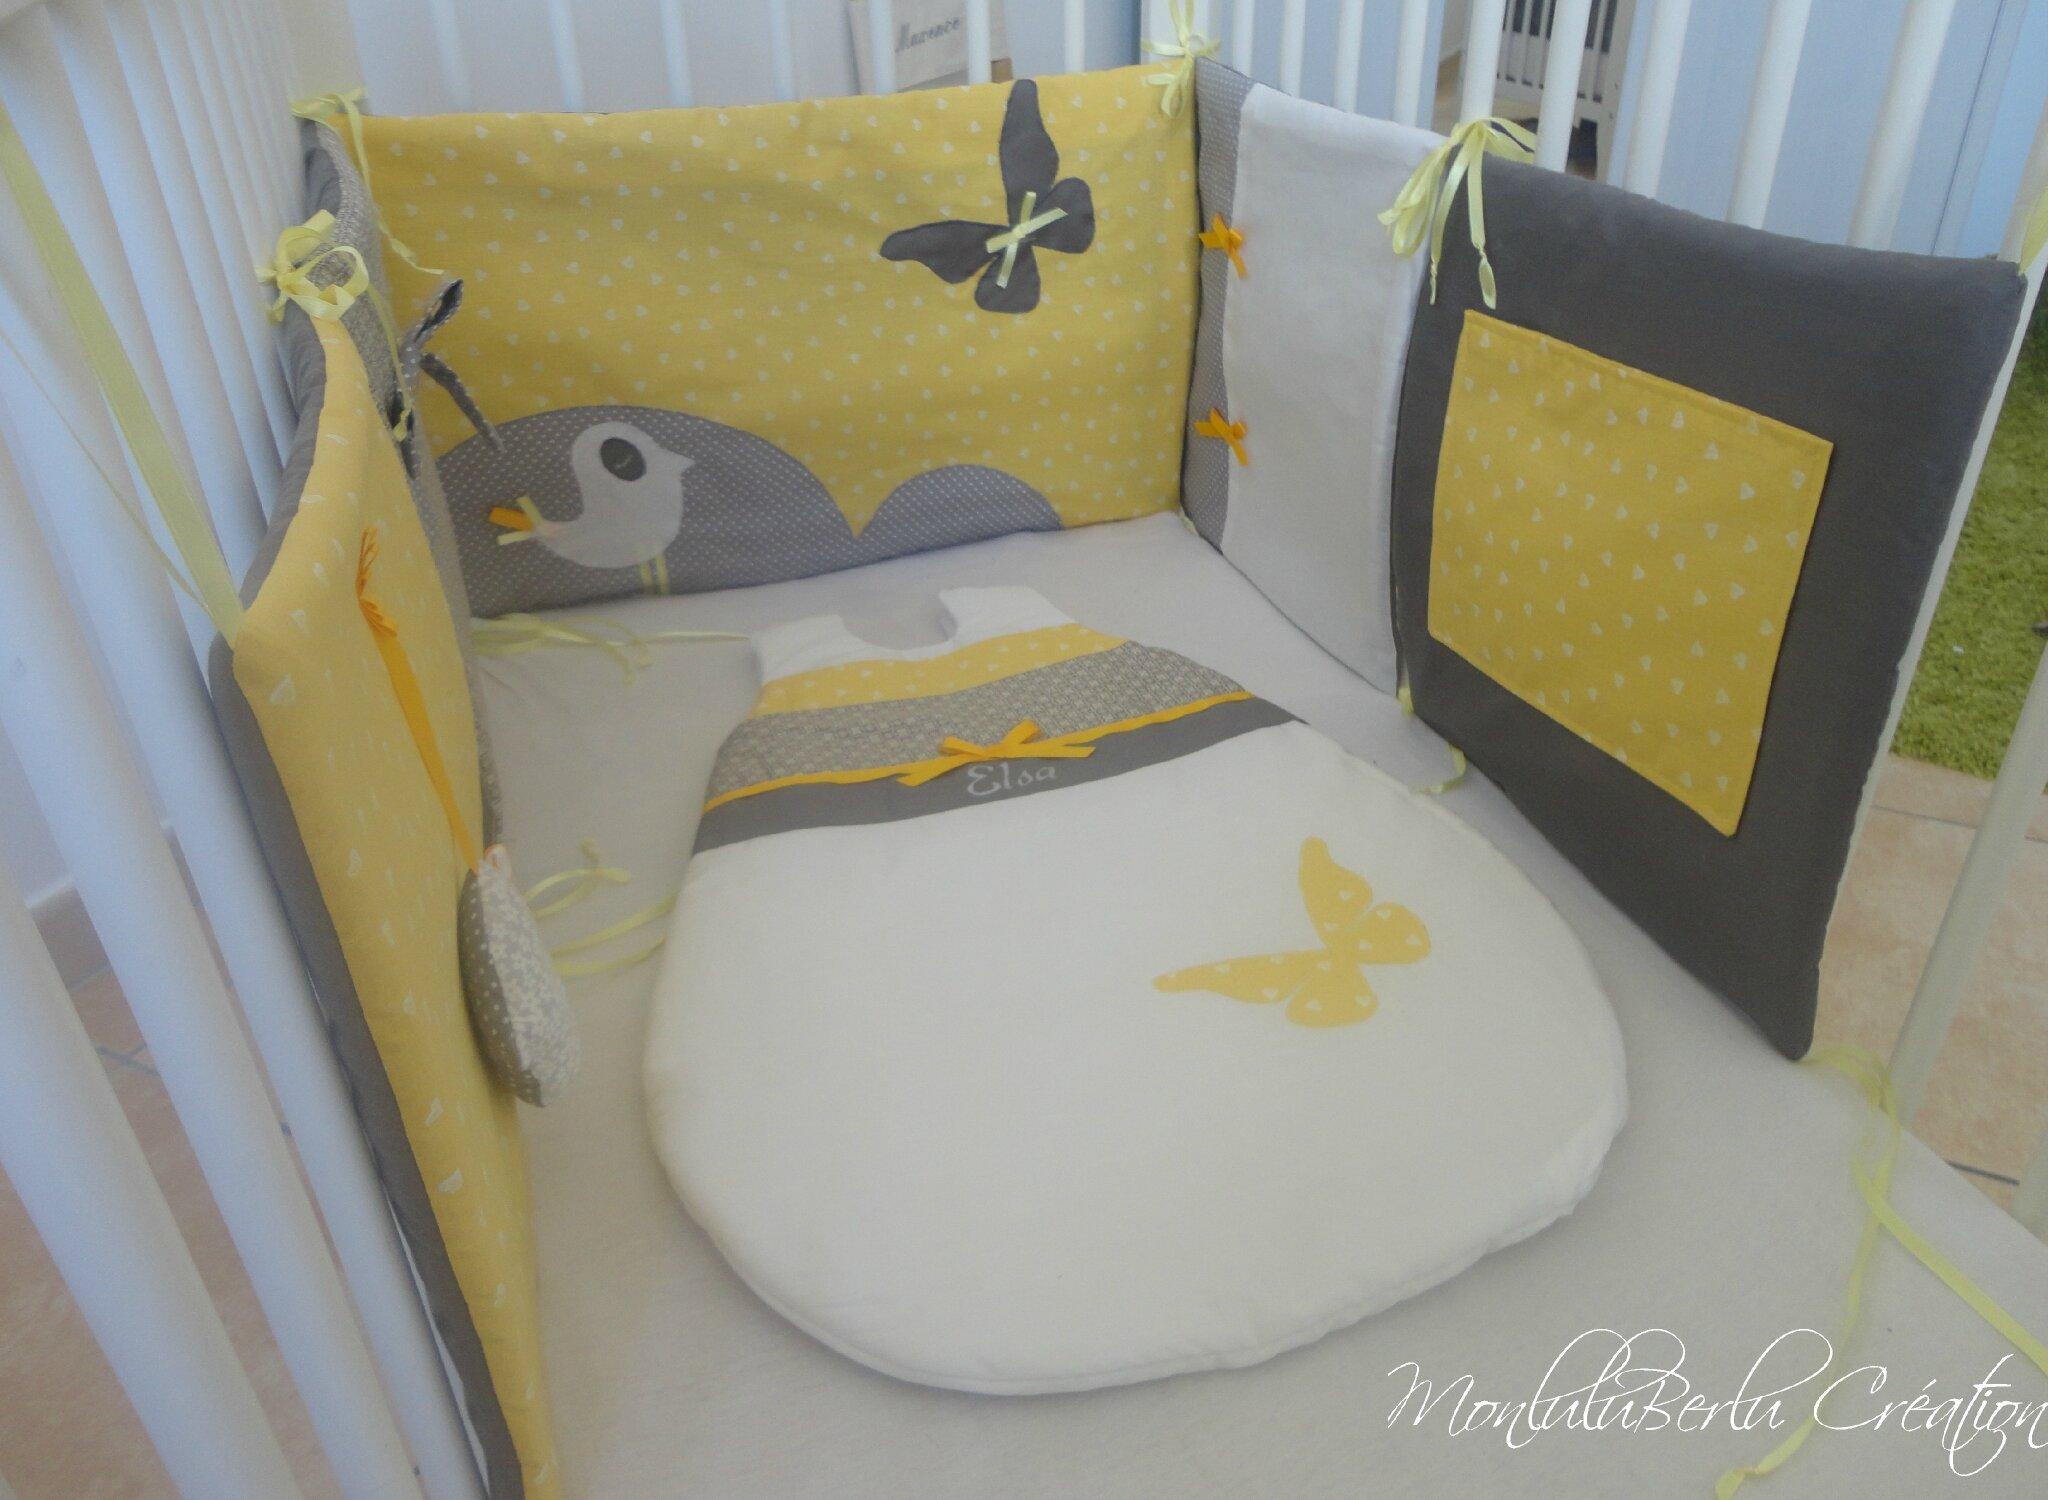 parures jumelles monluluberlu cr ation. Black Bedroom Furniture Sets. Home Design Ideas